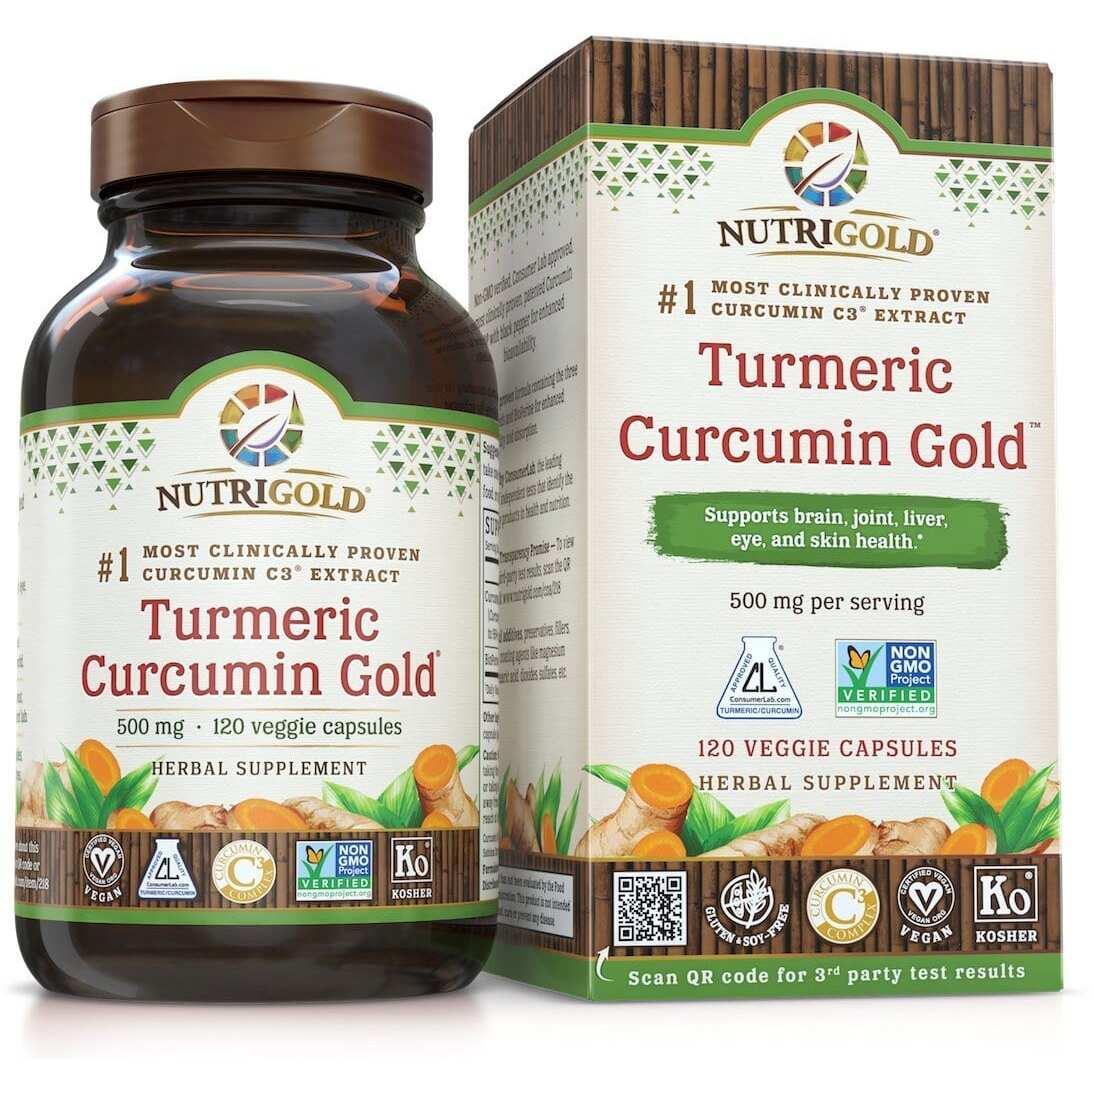 Nutrigold Turmeric Curcumin Gold - 500mg - 120 Veggie Caps-0